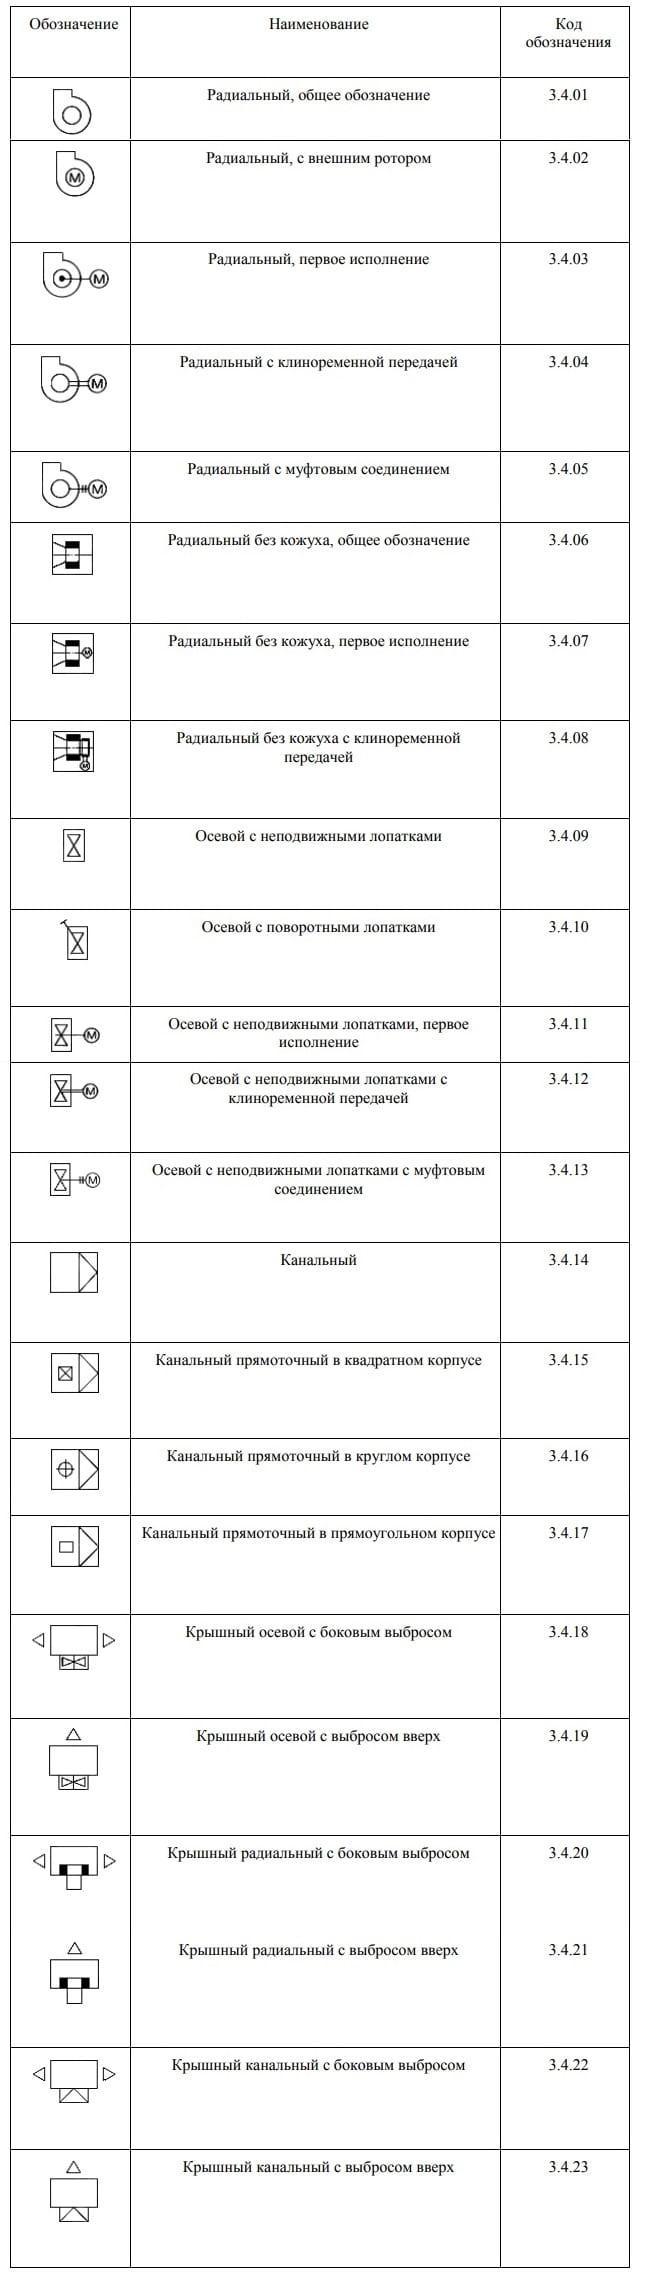 таблица с графическими изображениями